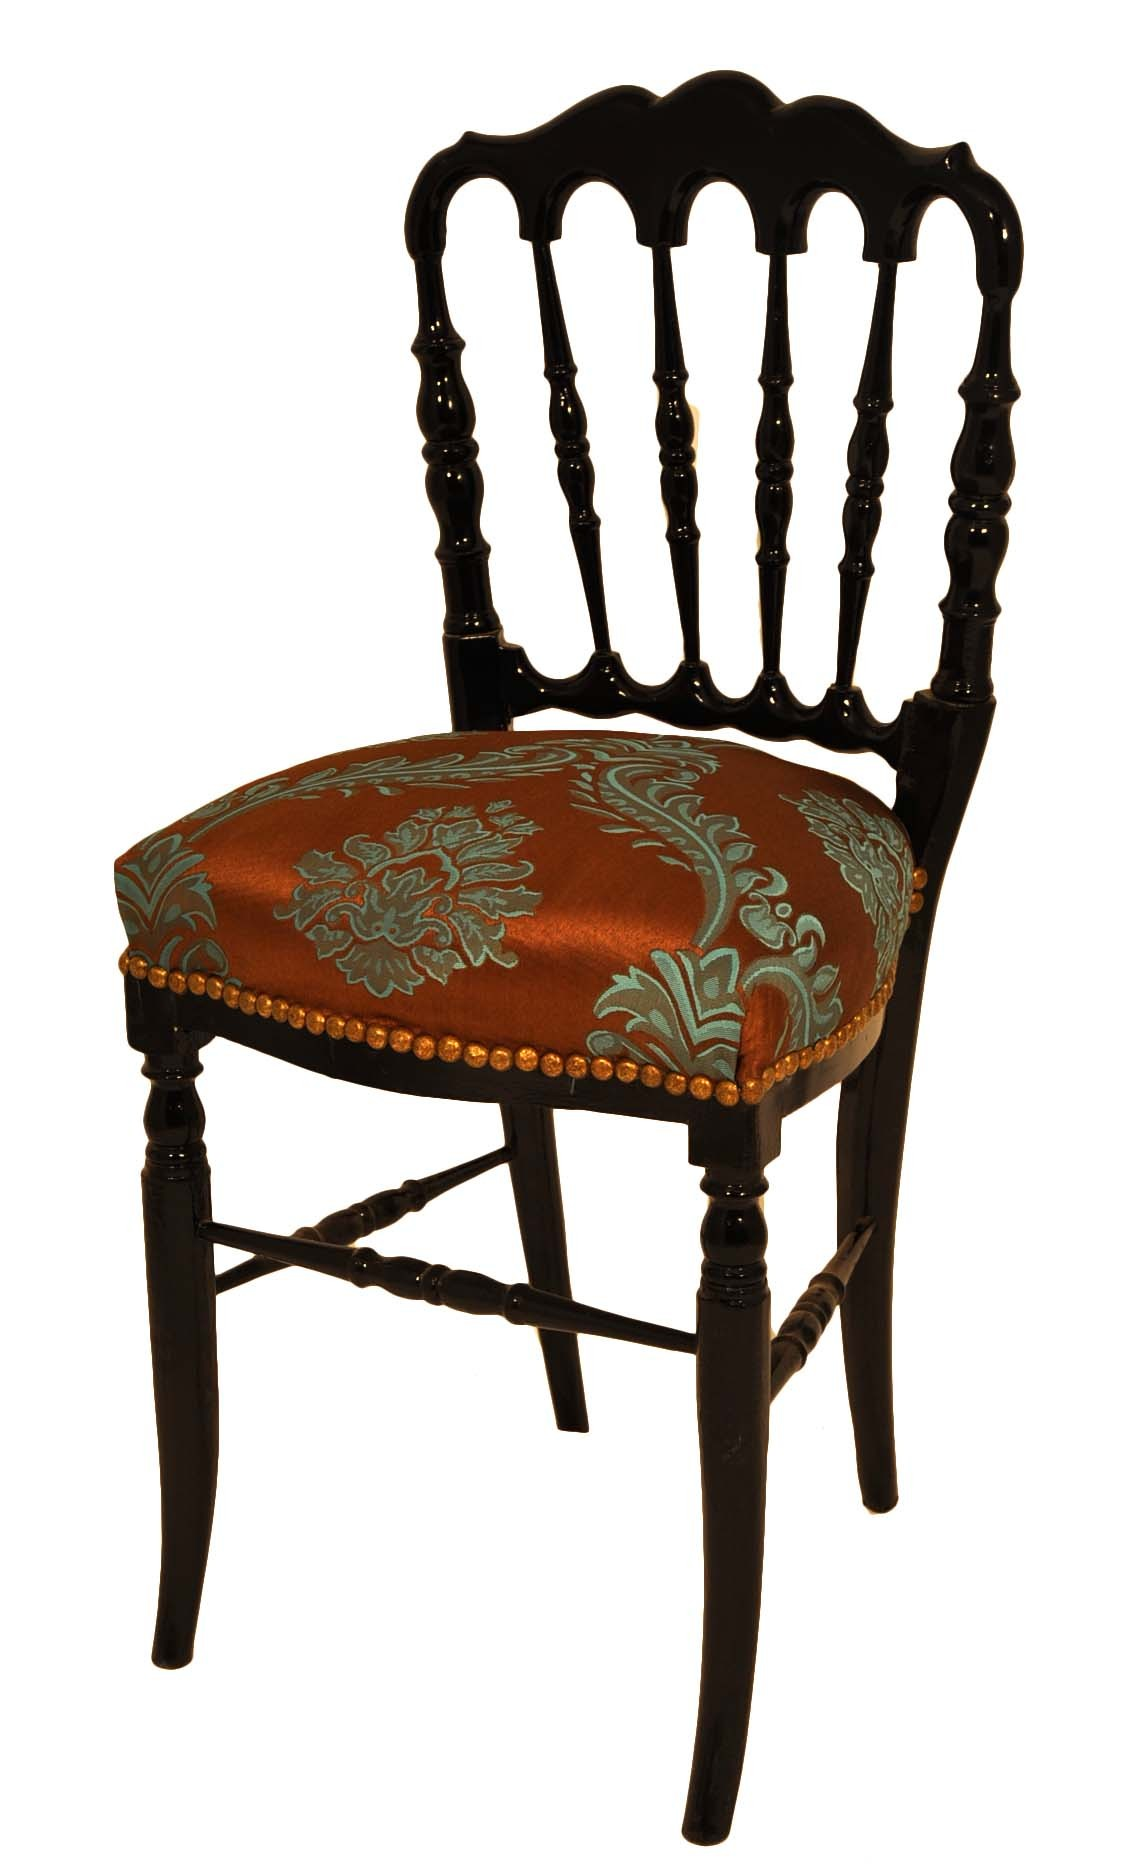 chaise napol on iii avec tissu imprim marron et turquoise demeure et jardin. Black Bedroom Furniture Sets. Home Design Ideas